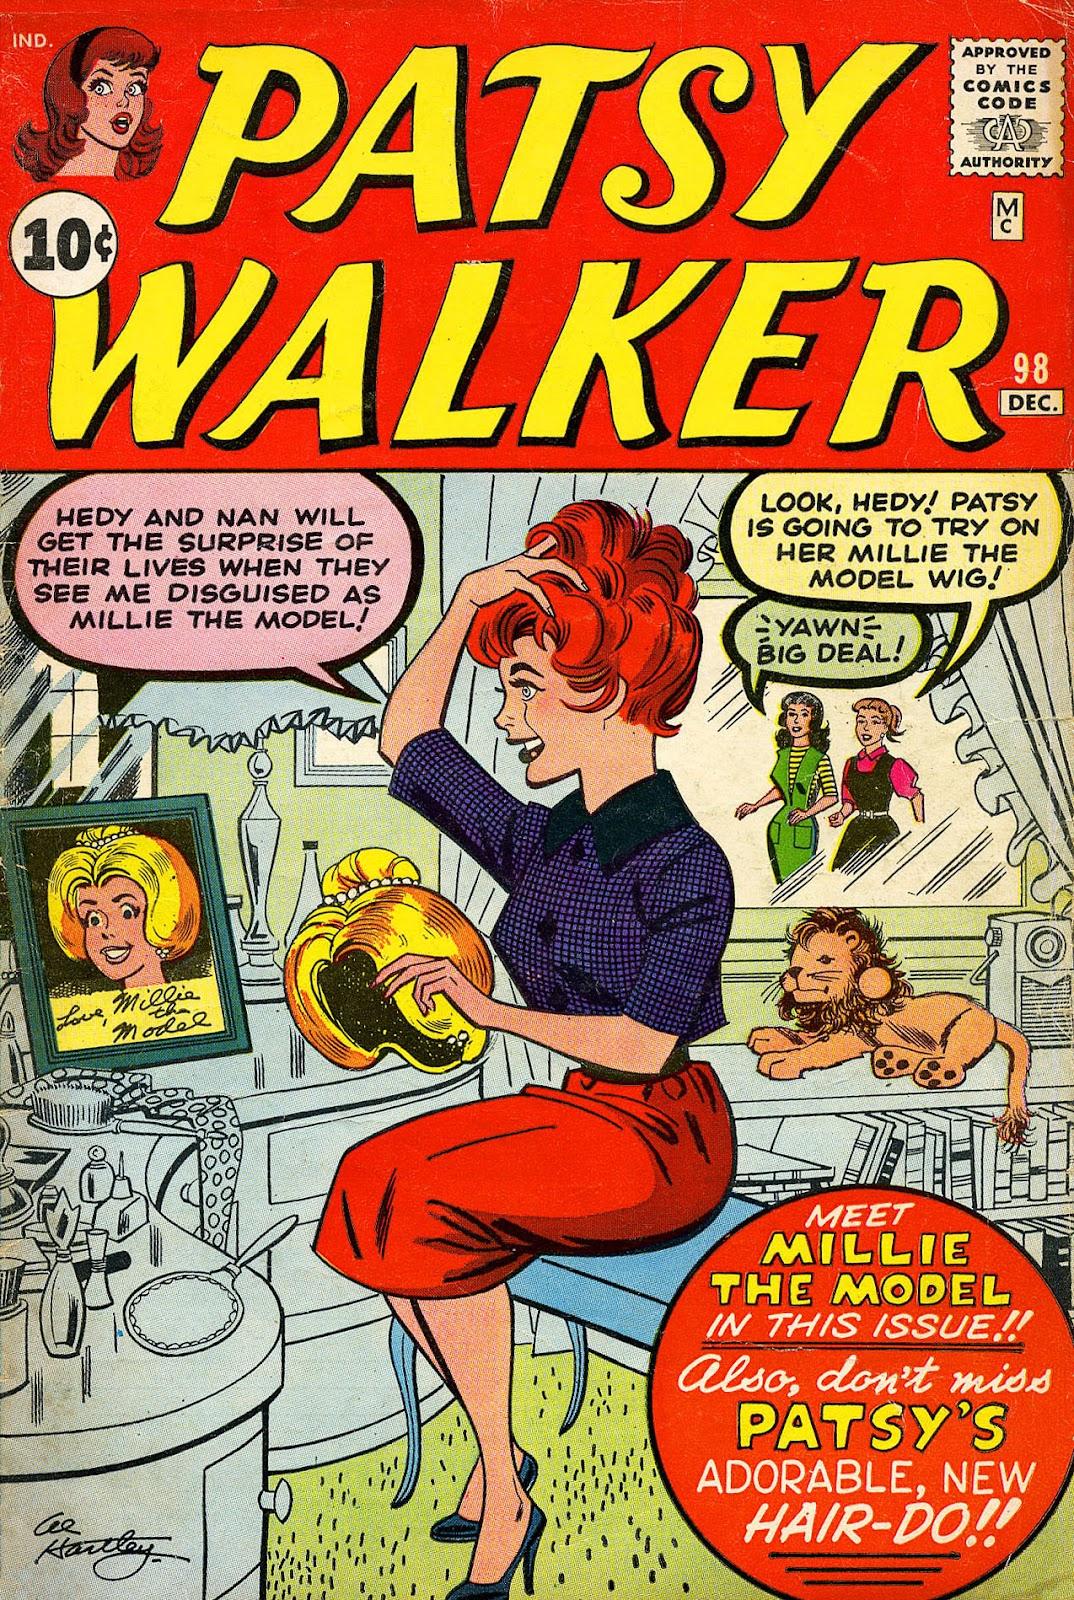 Patsy Walker 98 Page 1